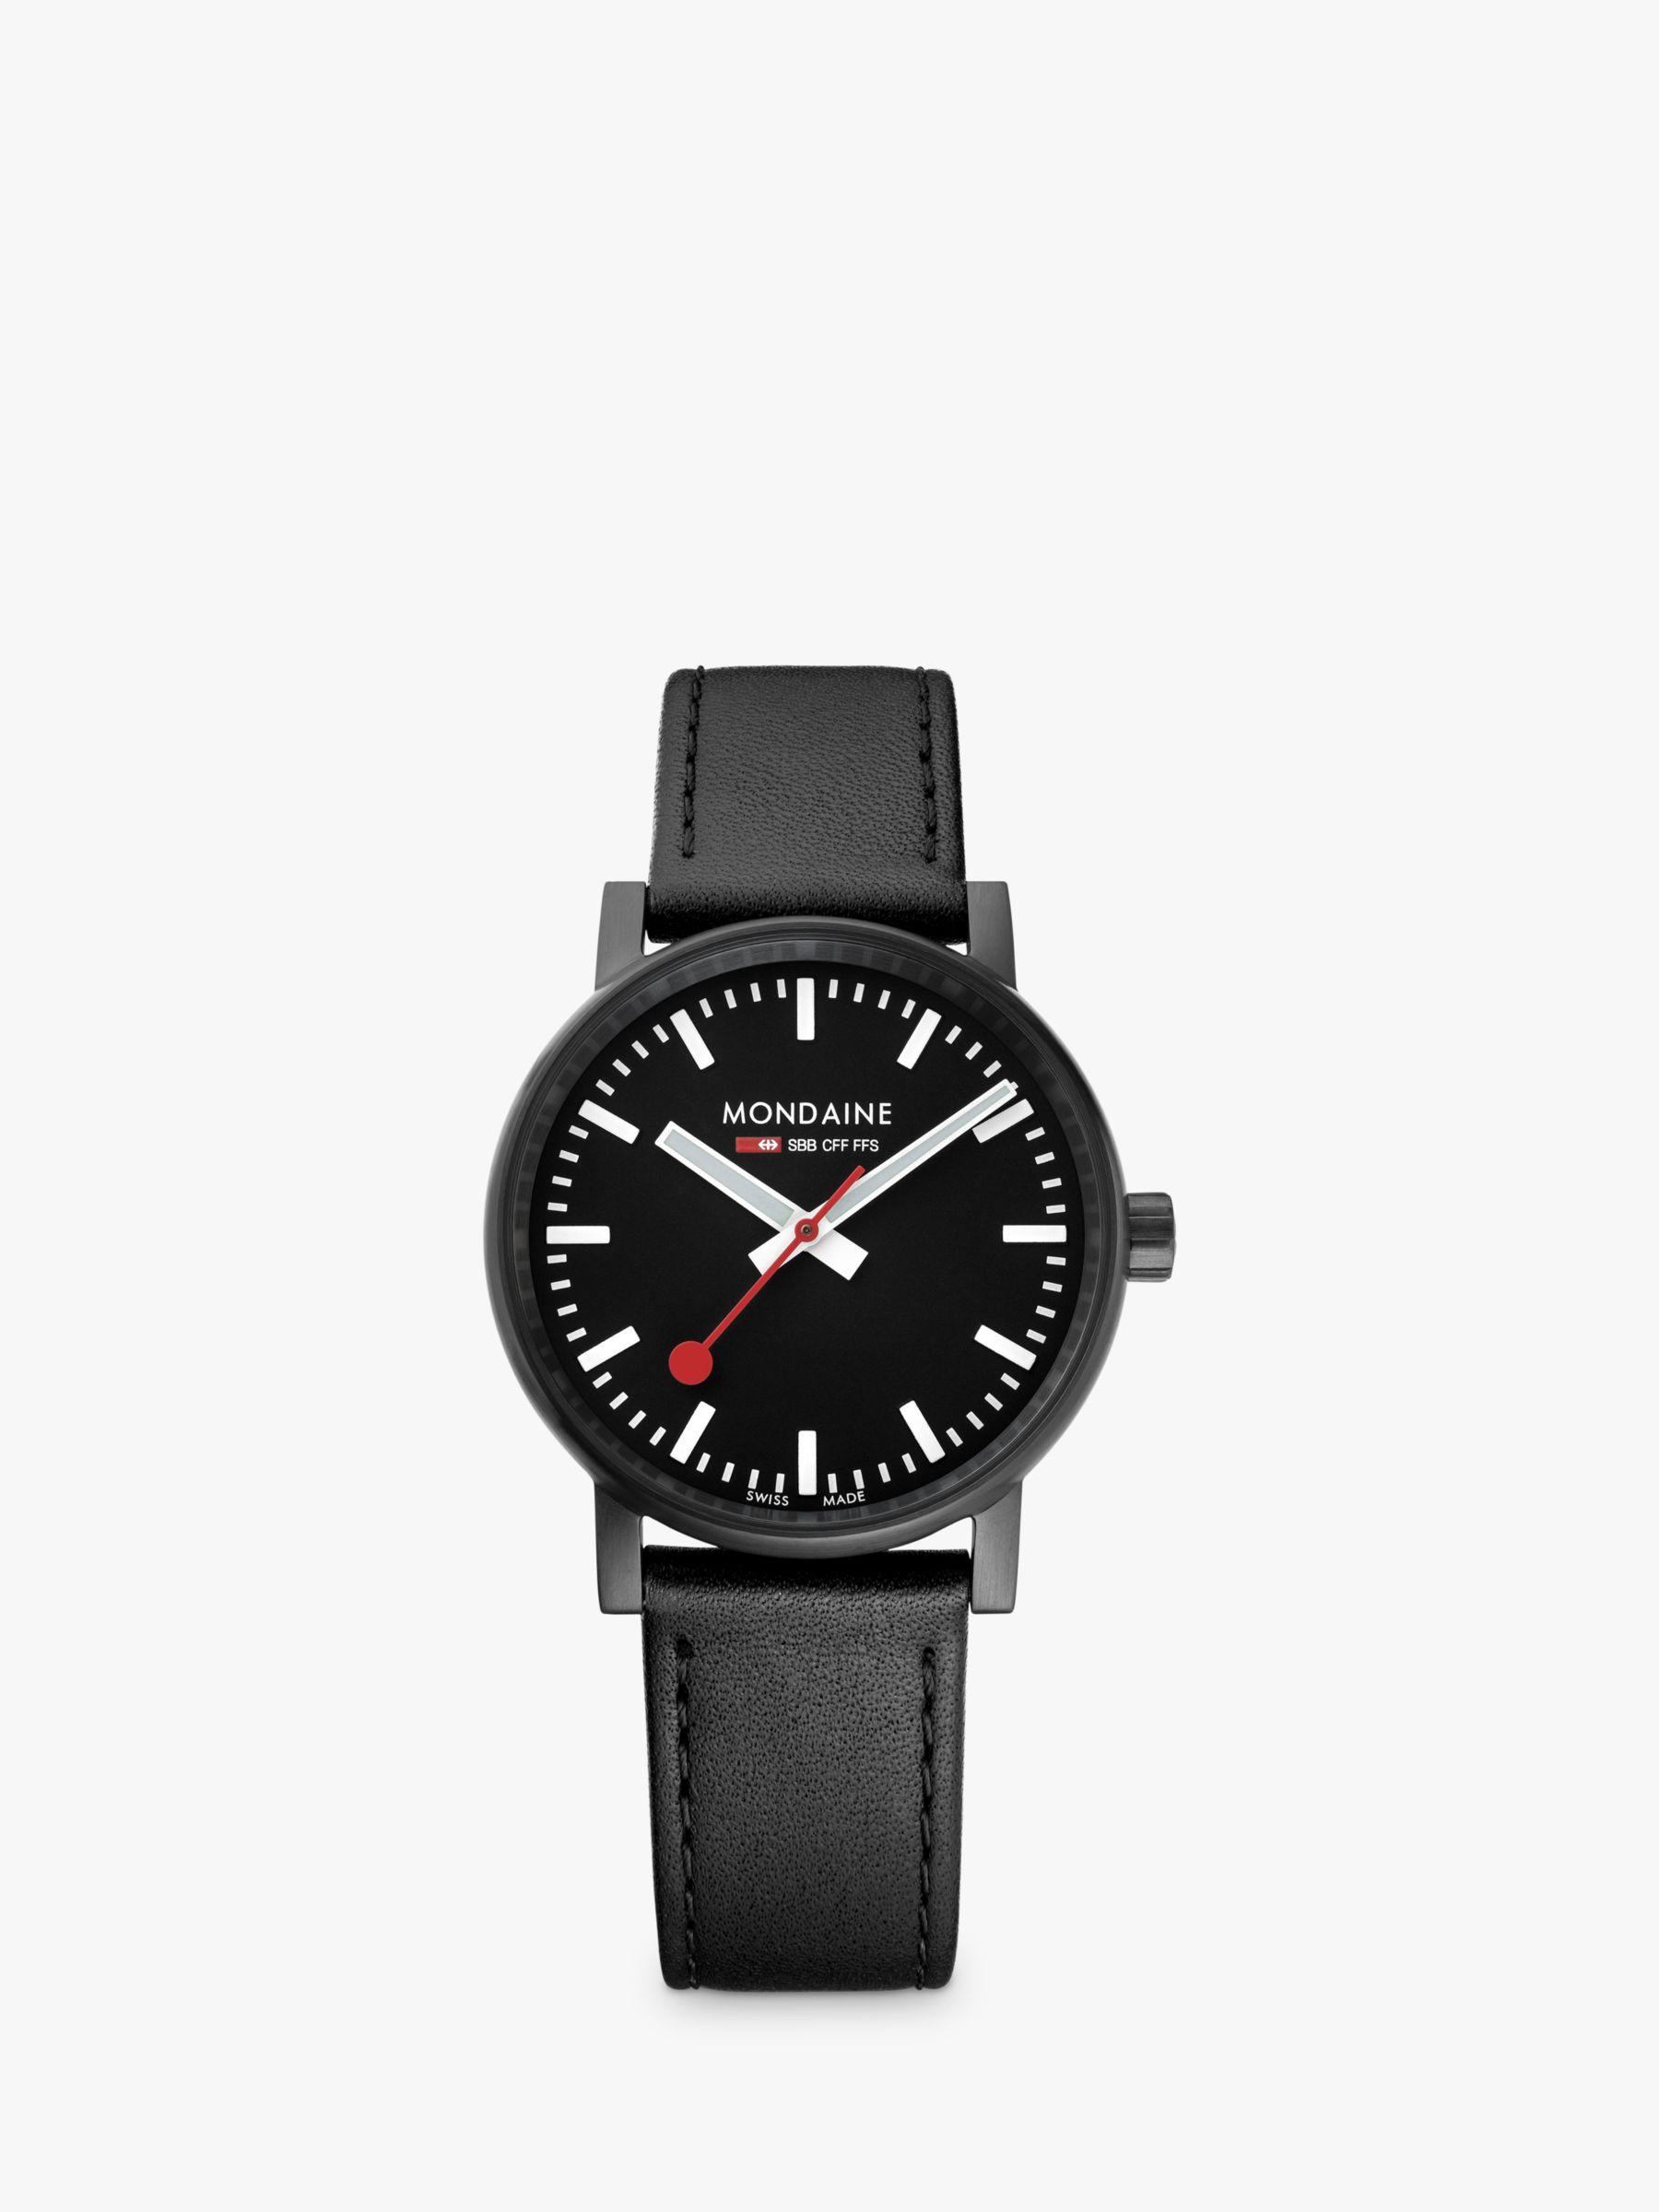 Mondaine Mondaine MSE.35121.LB Unisex Evo 2 Leather Strap Watch, Black